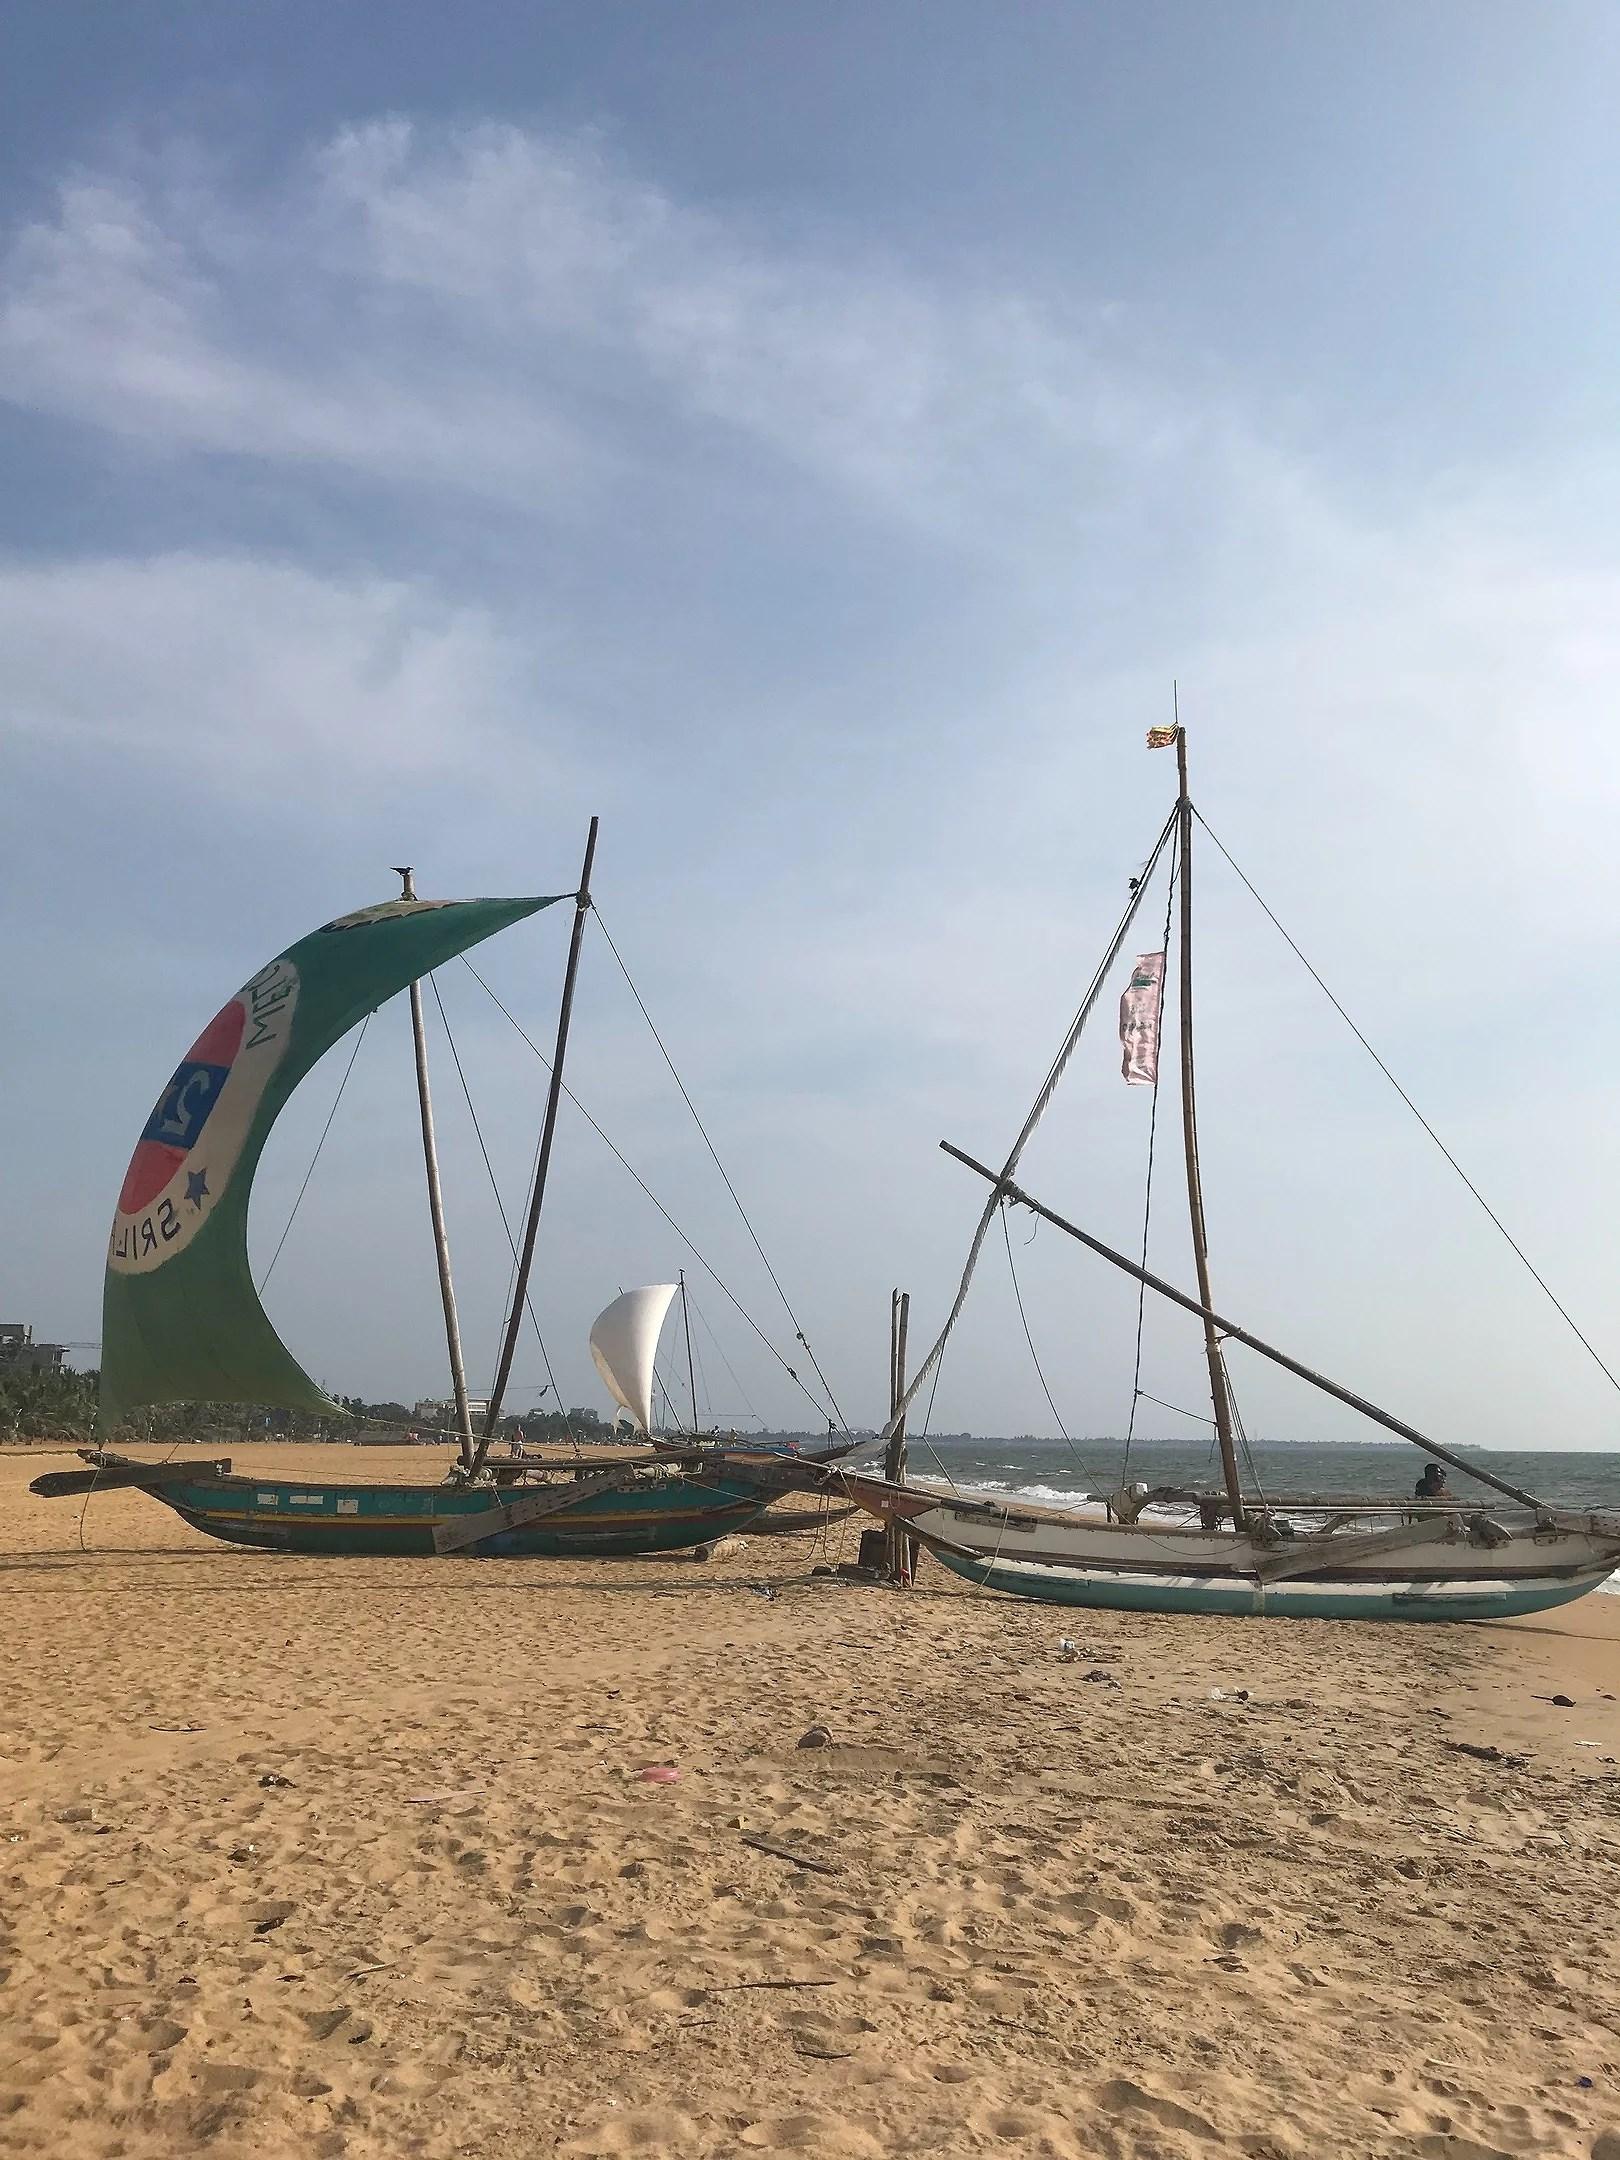 Sun and Negombo beach